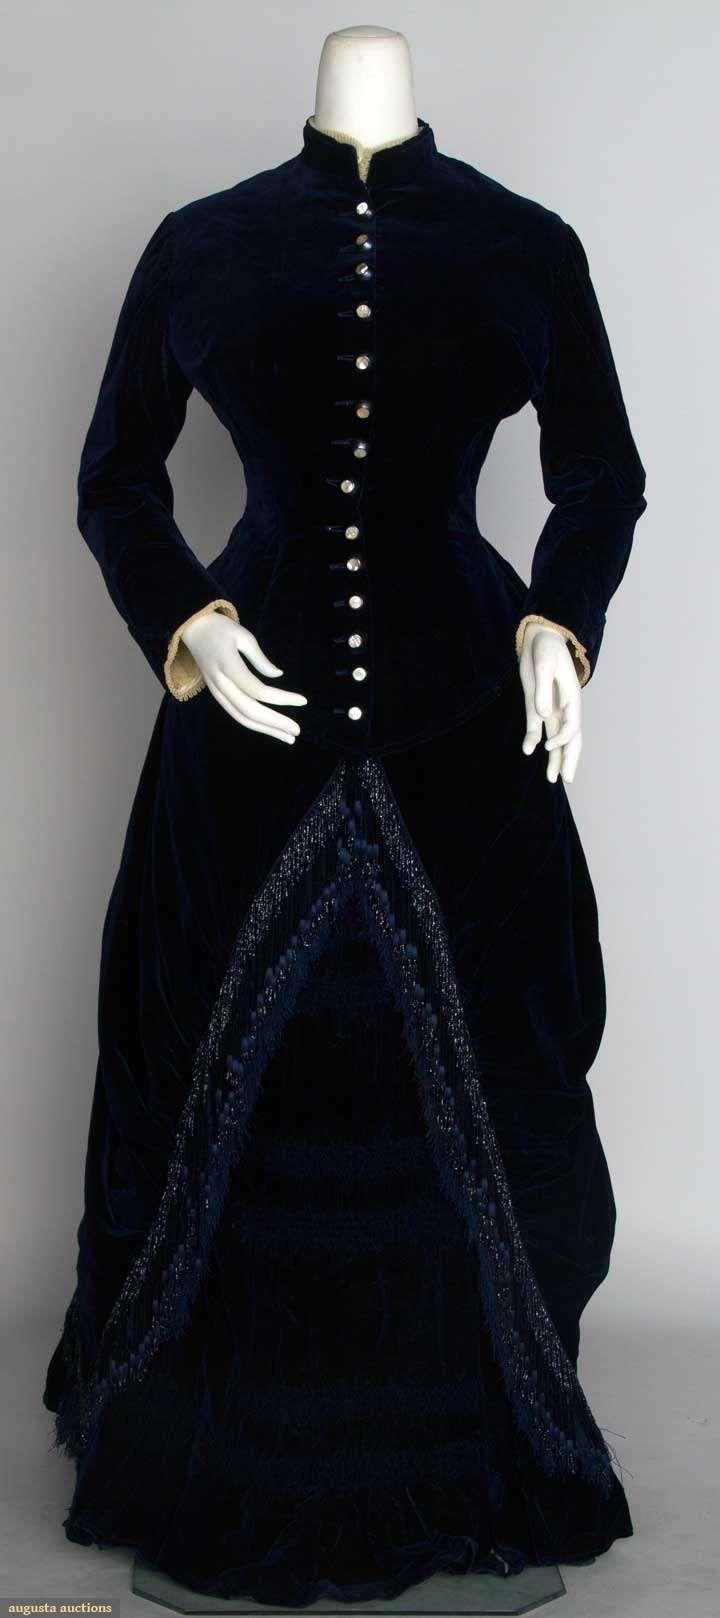 Harry bertoia for knoll inc bird chair catawiki - Navy Velvet Bustle Dress C 1882 Augusta Auctions November 13 2013